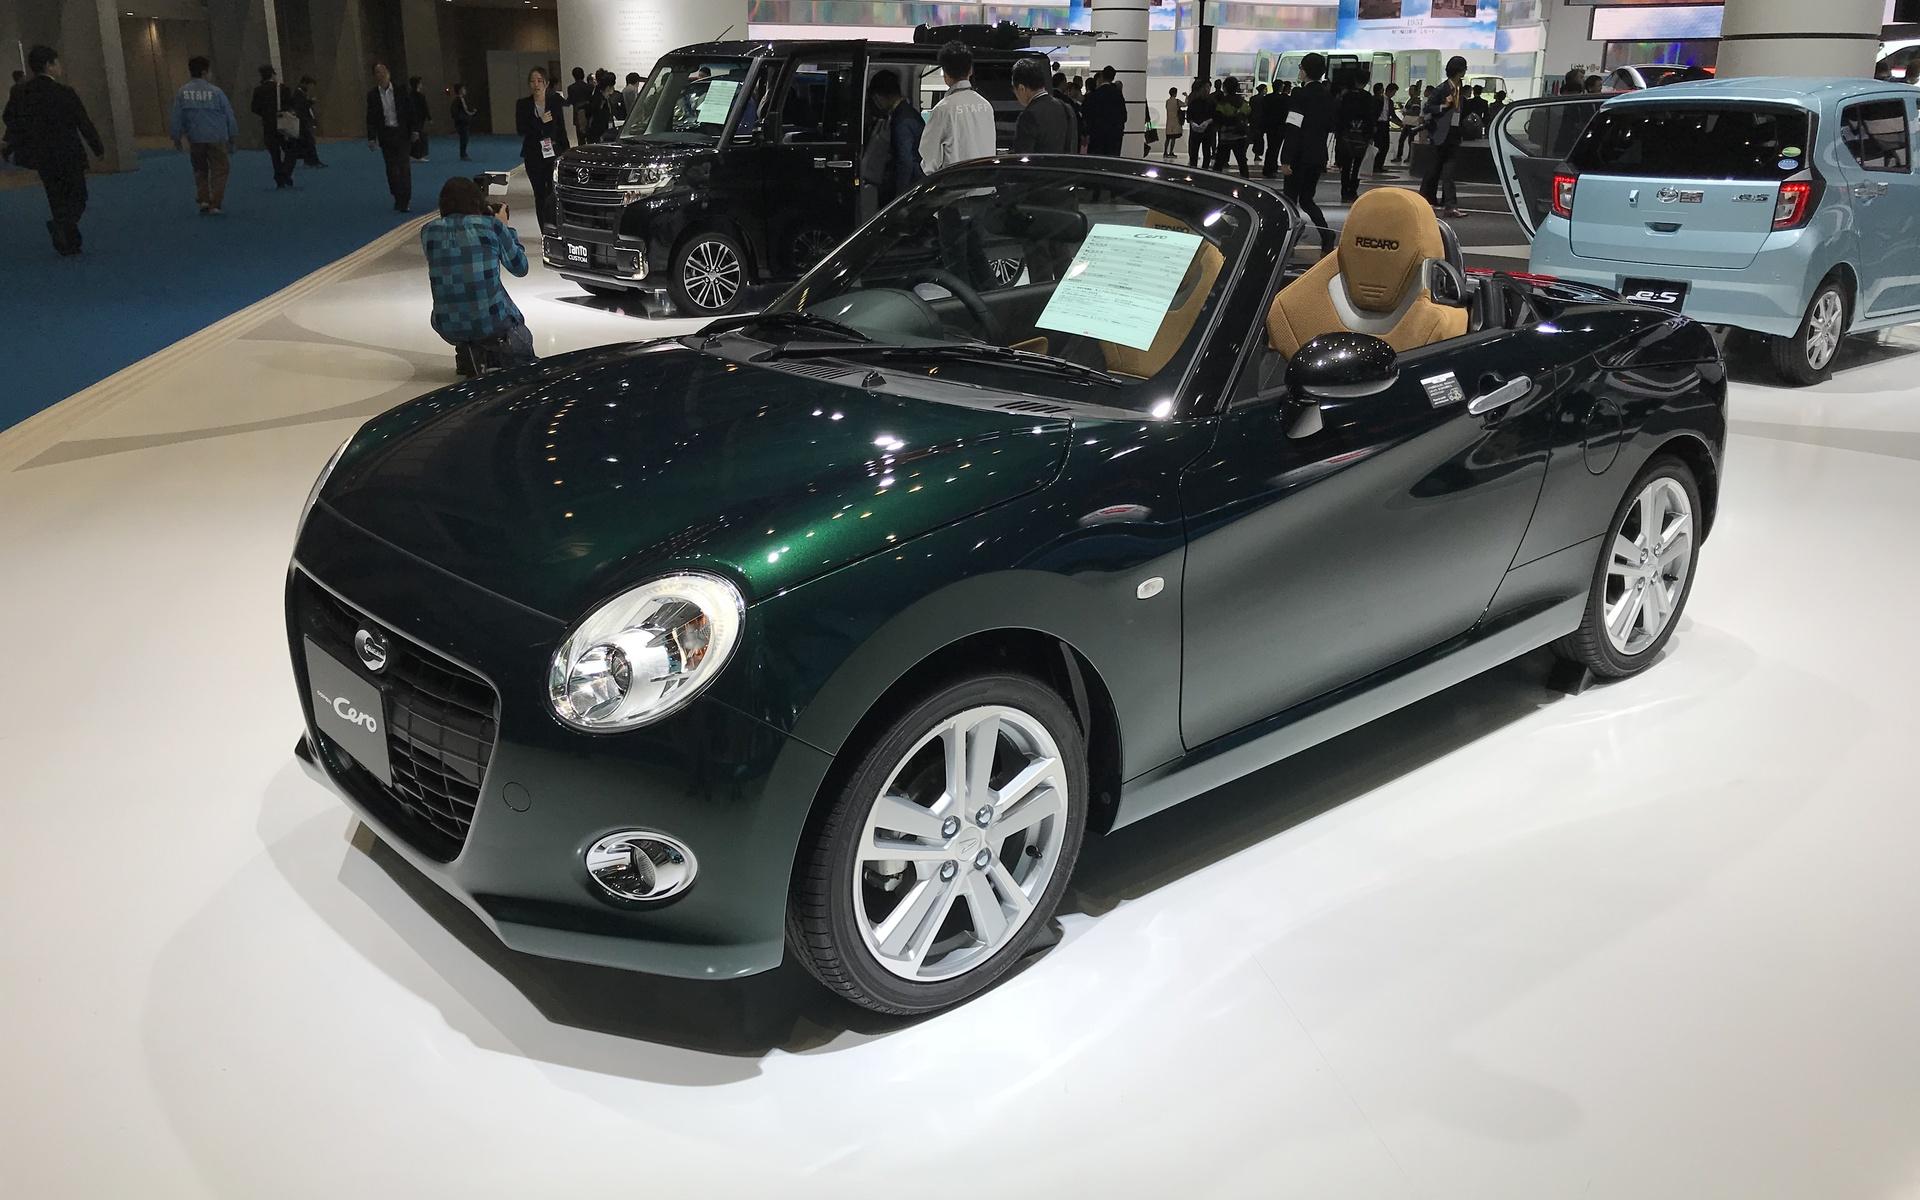 <p>Daihatsu Copen Cero</p>